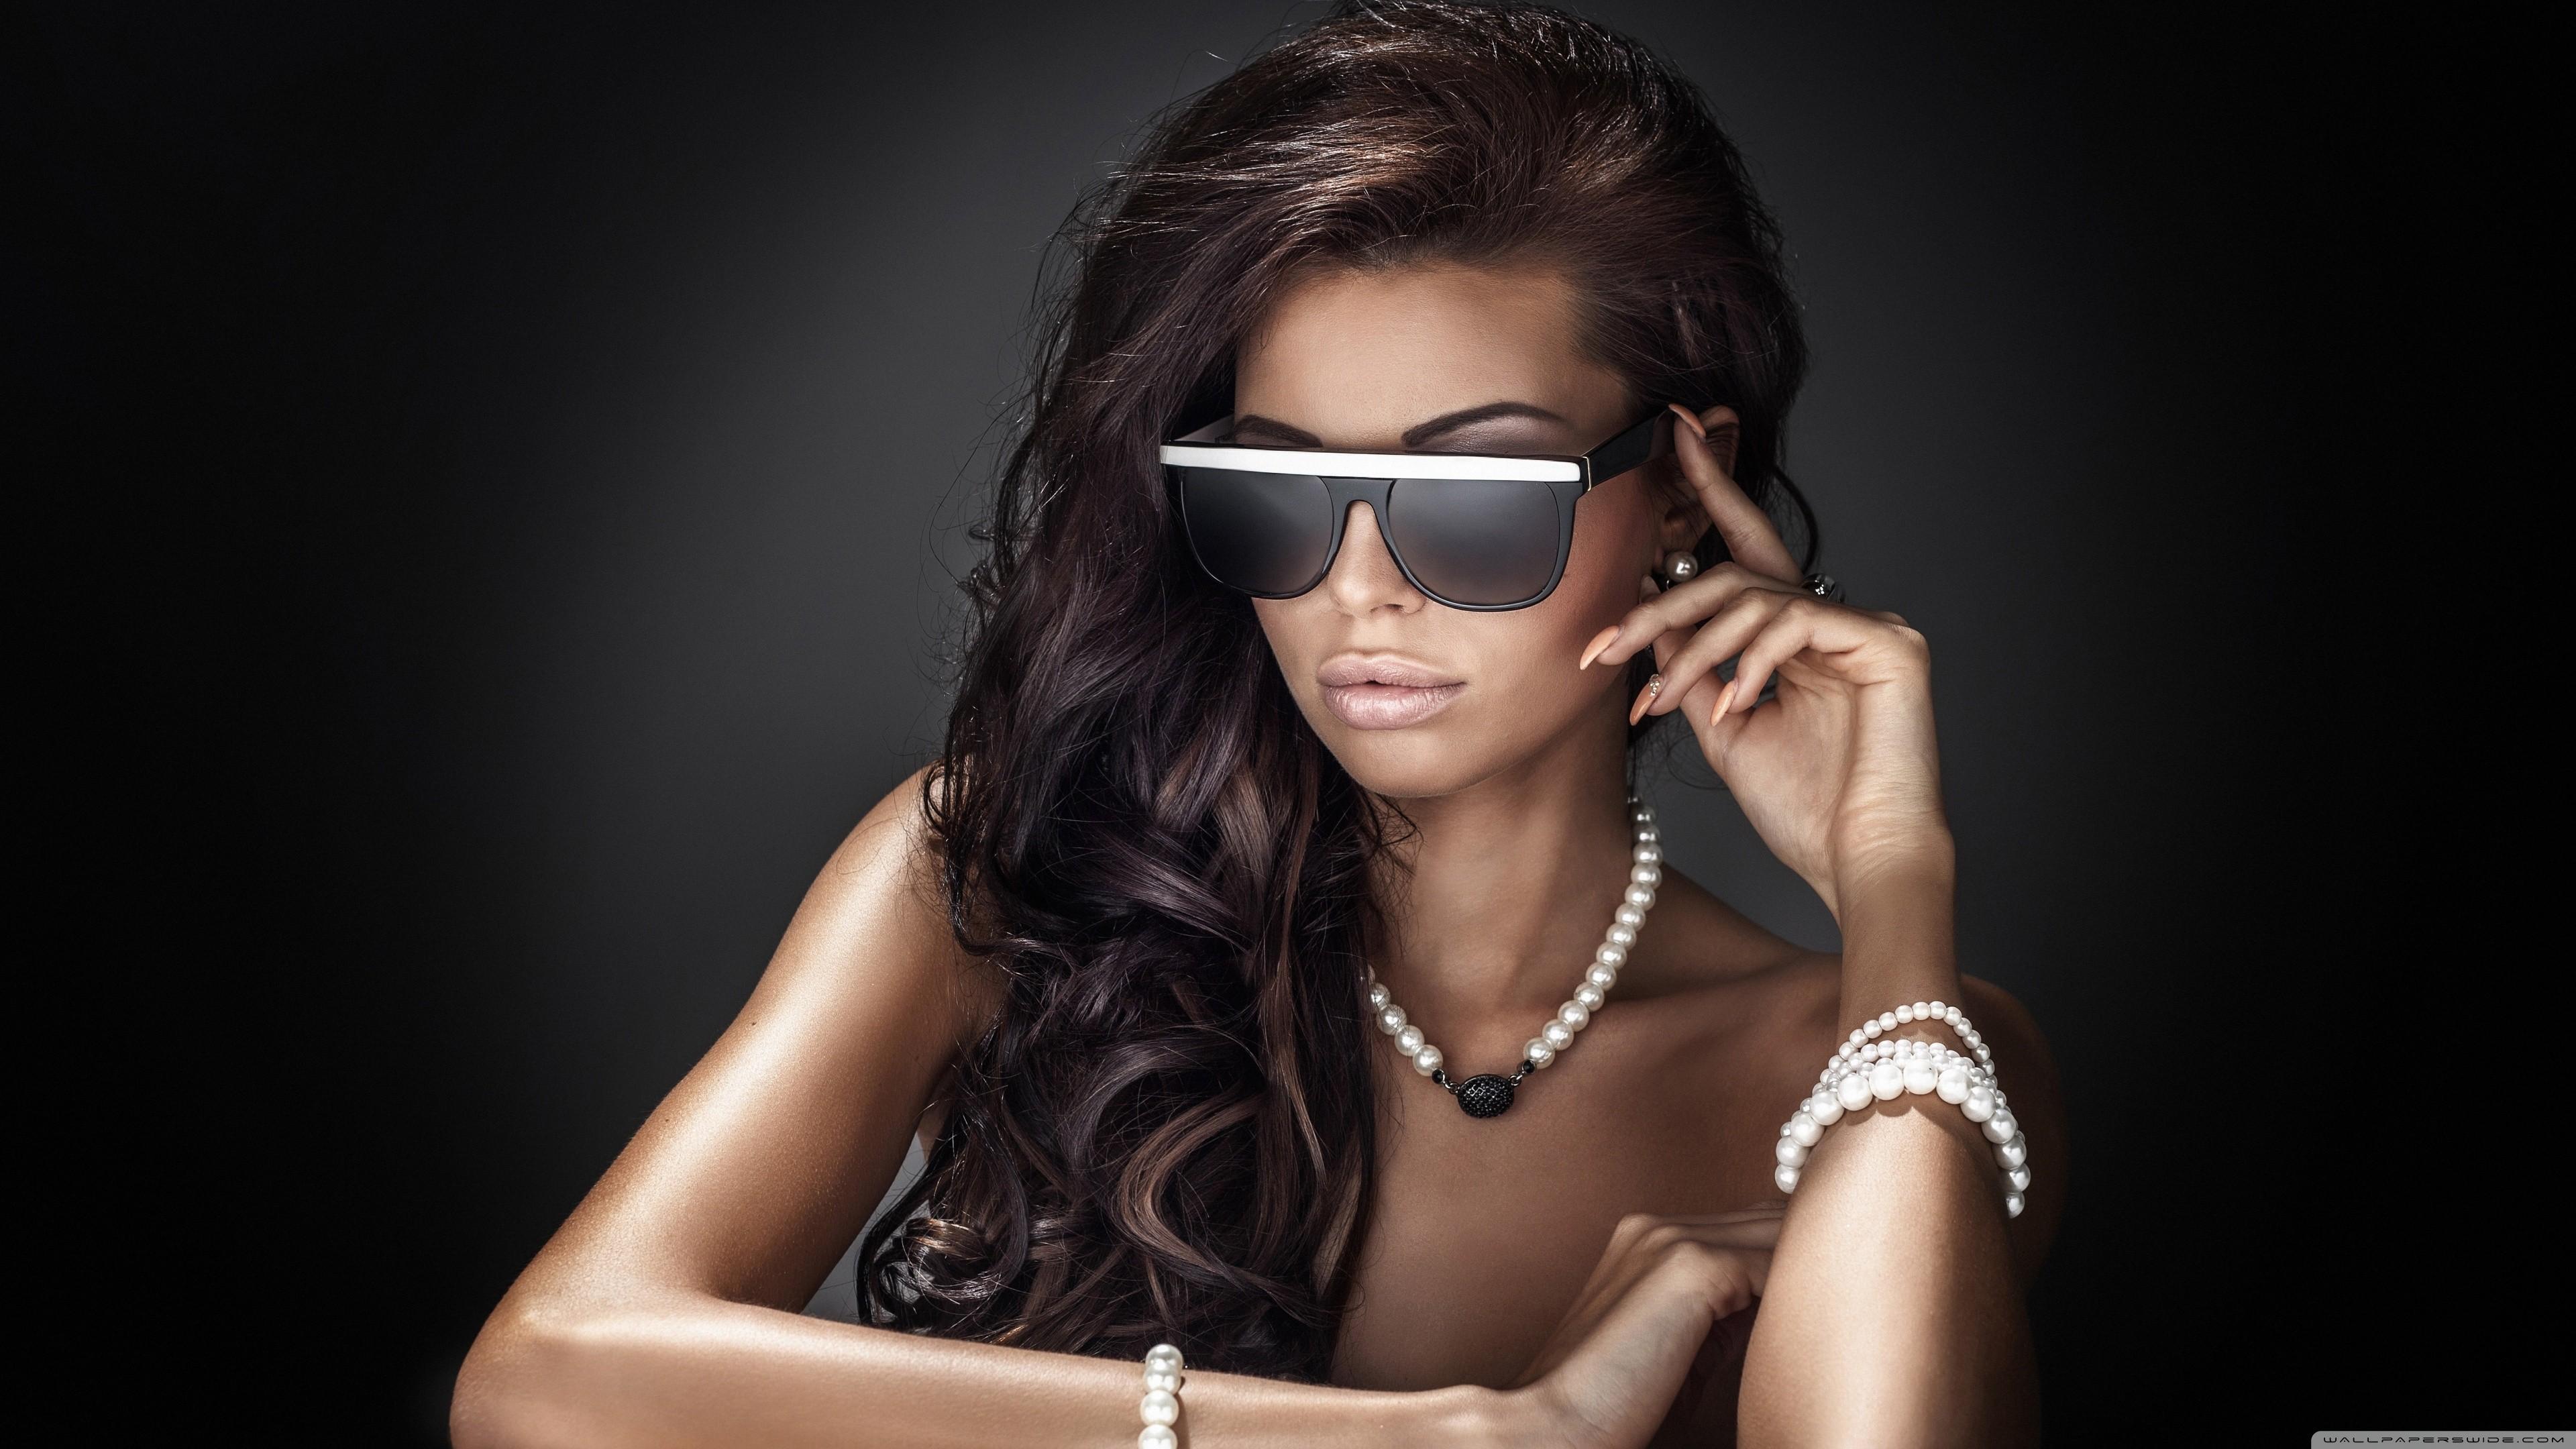 People 3840x2160 sunglasses women women with shades brunette long hair dark skin tanned pearl bracelet pearl necklace